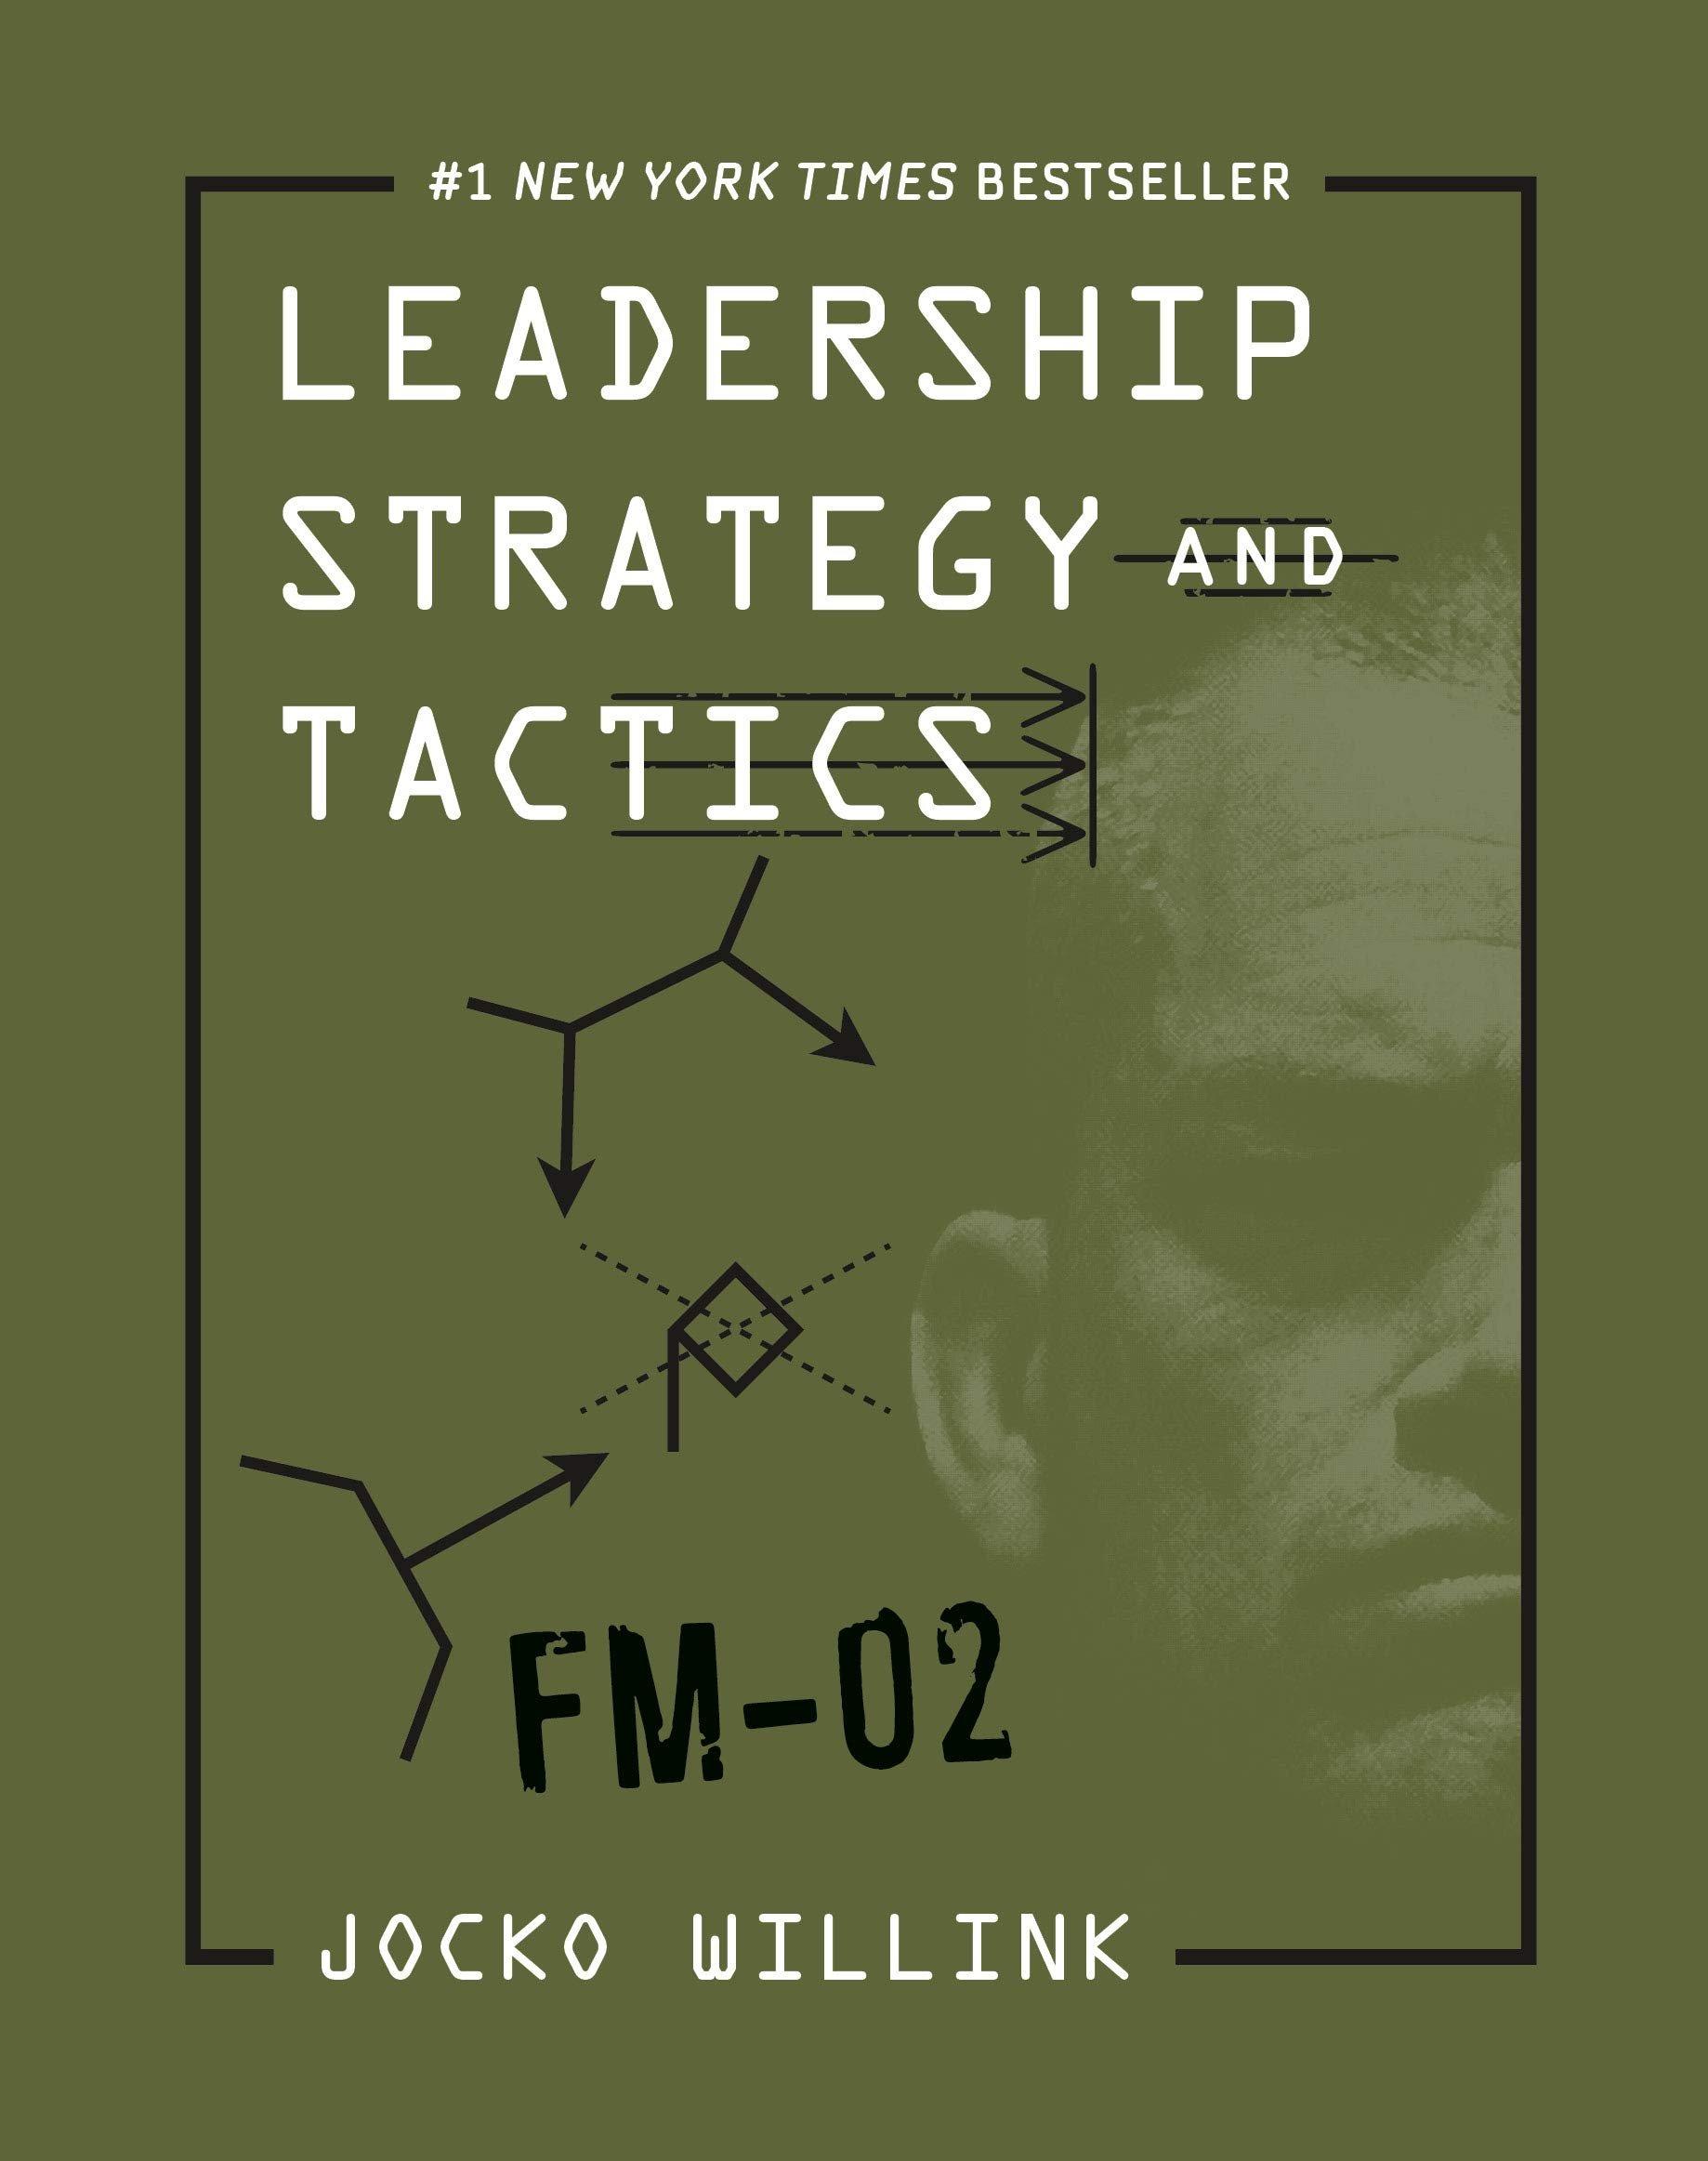 Leadership Strategy and Tactics: Field Manual von Jocko Willink